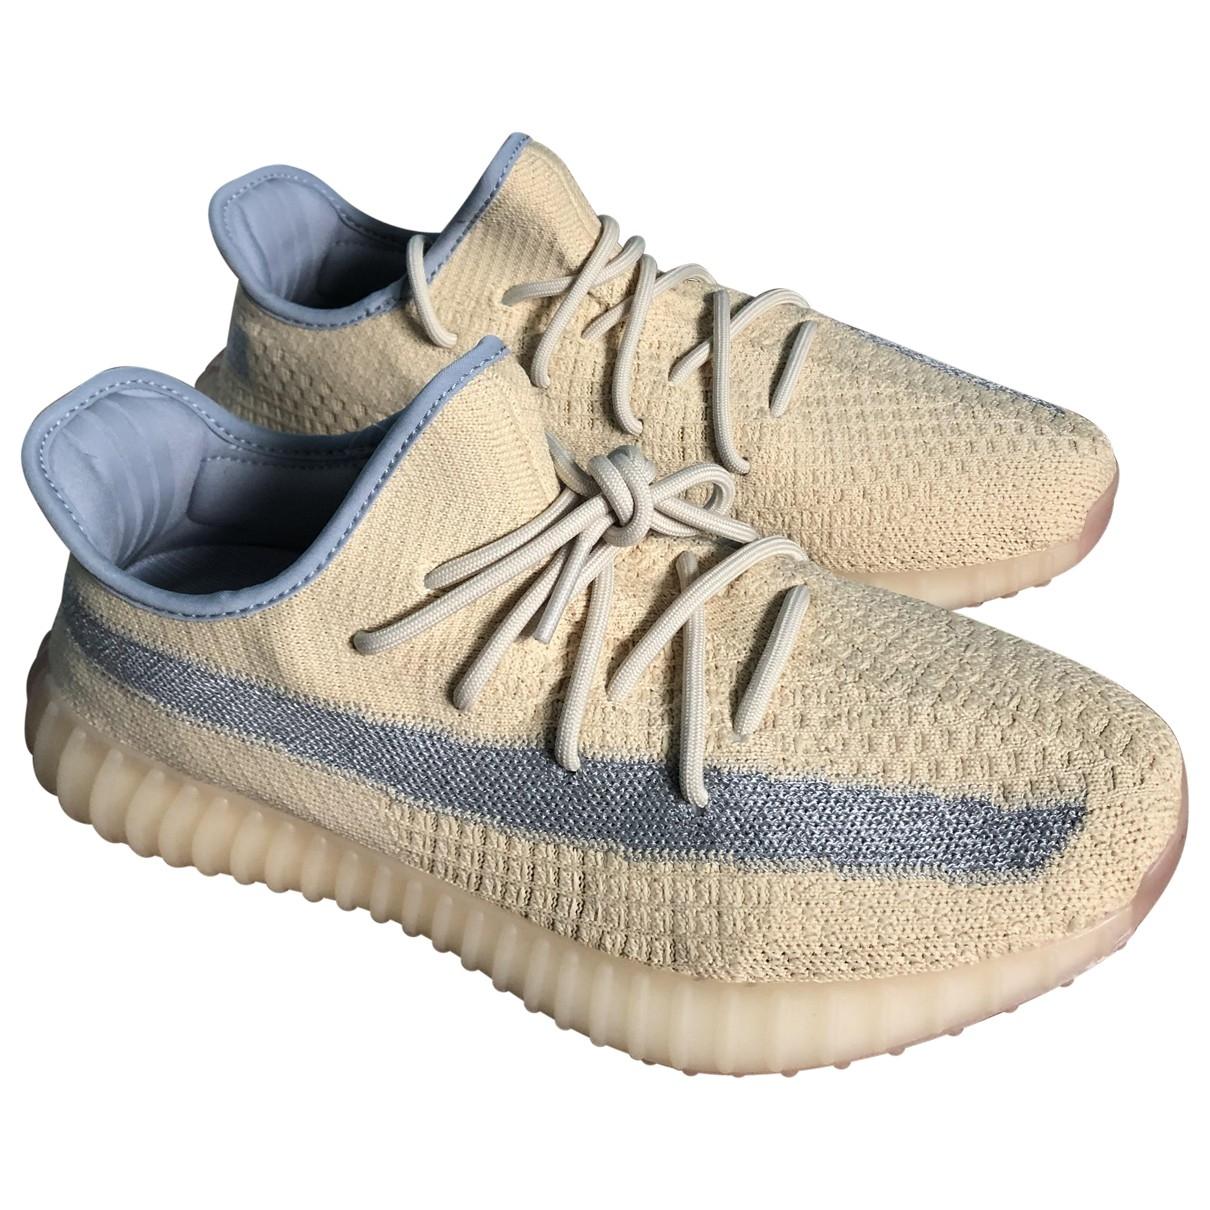 Yeezy X Adidas - Baskets Boost 350 V2 pour homme en toile - beige